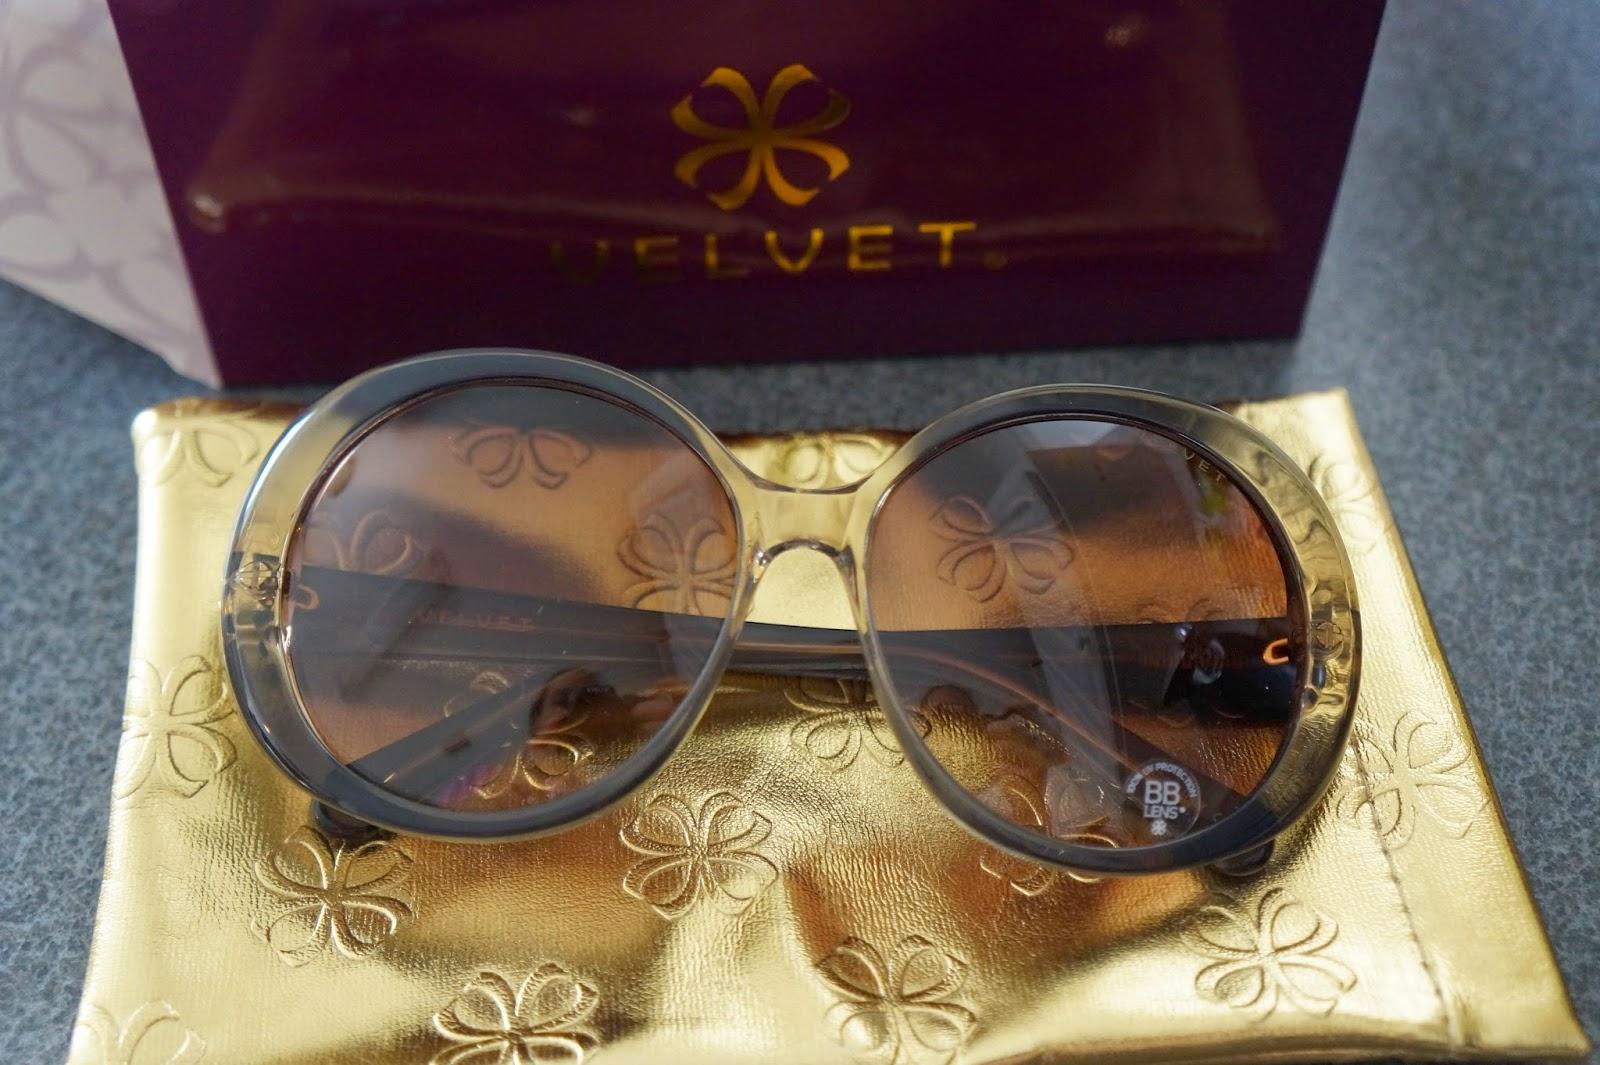 51445f6388 Andrea s World Reviews  Christmas Wishes - Velvet Eyewear Review ...